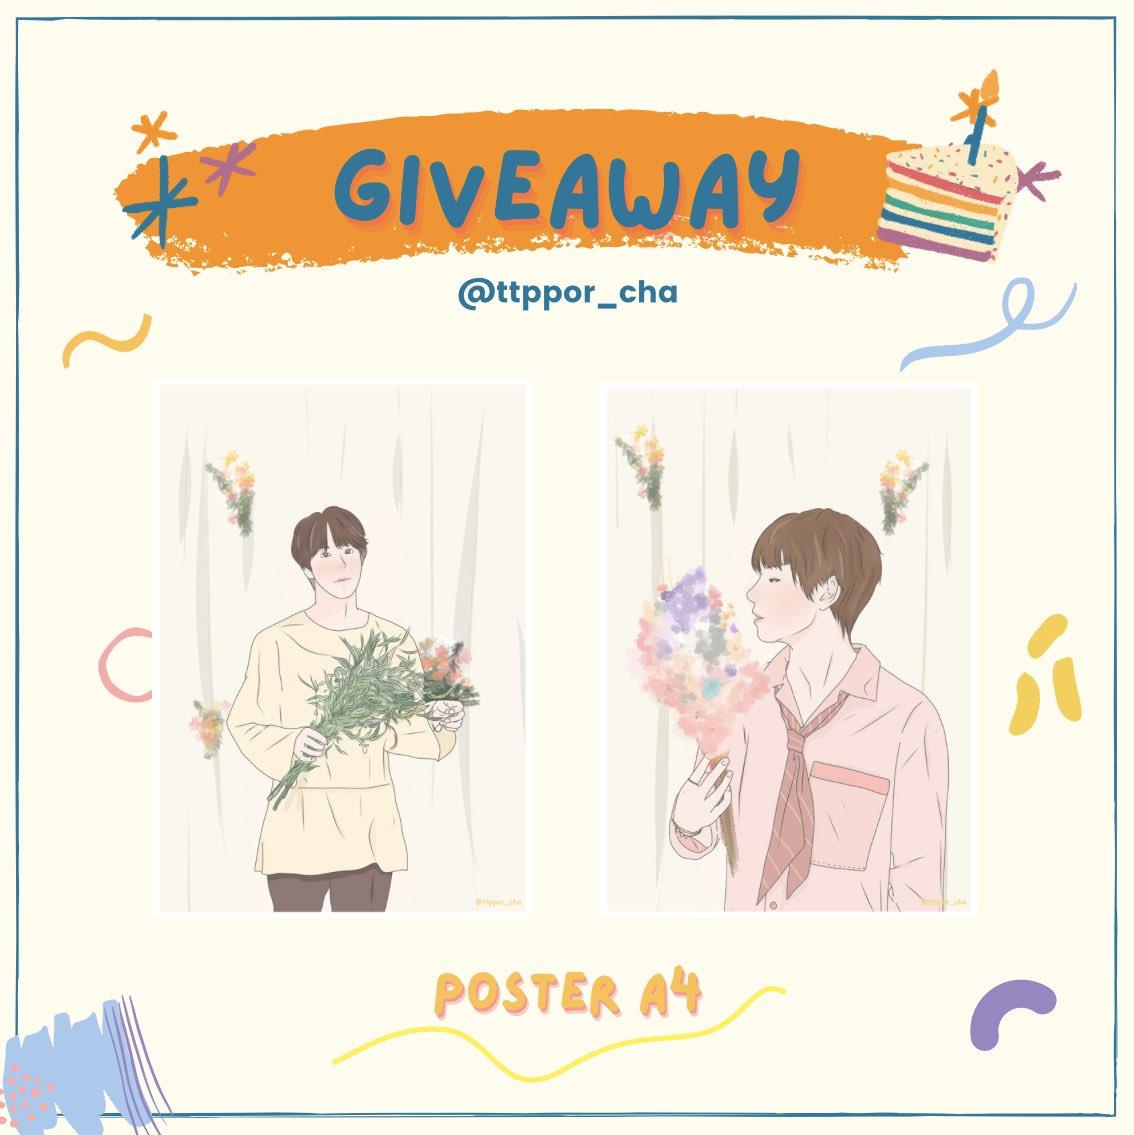 *・῾ ꒰ ᵎ യ  Plz rt  ₊˚ˑ ꒱  Give away Jin&Taehyung Day ˚ ༘   Poster A4 100 ea  🗓 : 05.12.20  📍 : siam   Ps.เราไม่ว่างไปฝากน้องแอค @park13oct ไปแจกนะงับ  รอบไปรใต้เธรดนะคะ  สุ่มส่งฟรีจากรี 2 คนนะงับ  #HappyBirthdayJin  #HAPPYJINDAY  #HappyTaehyungDay  #HappyBirthdayTaehyung